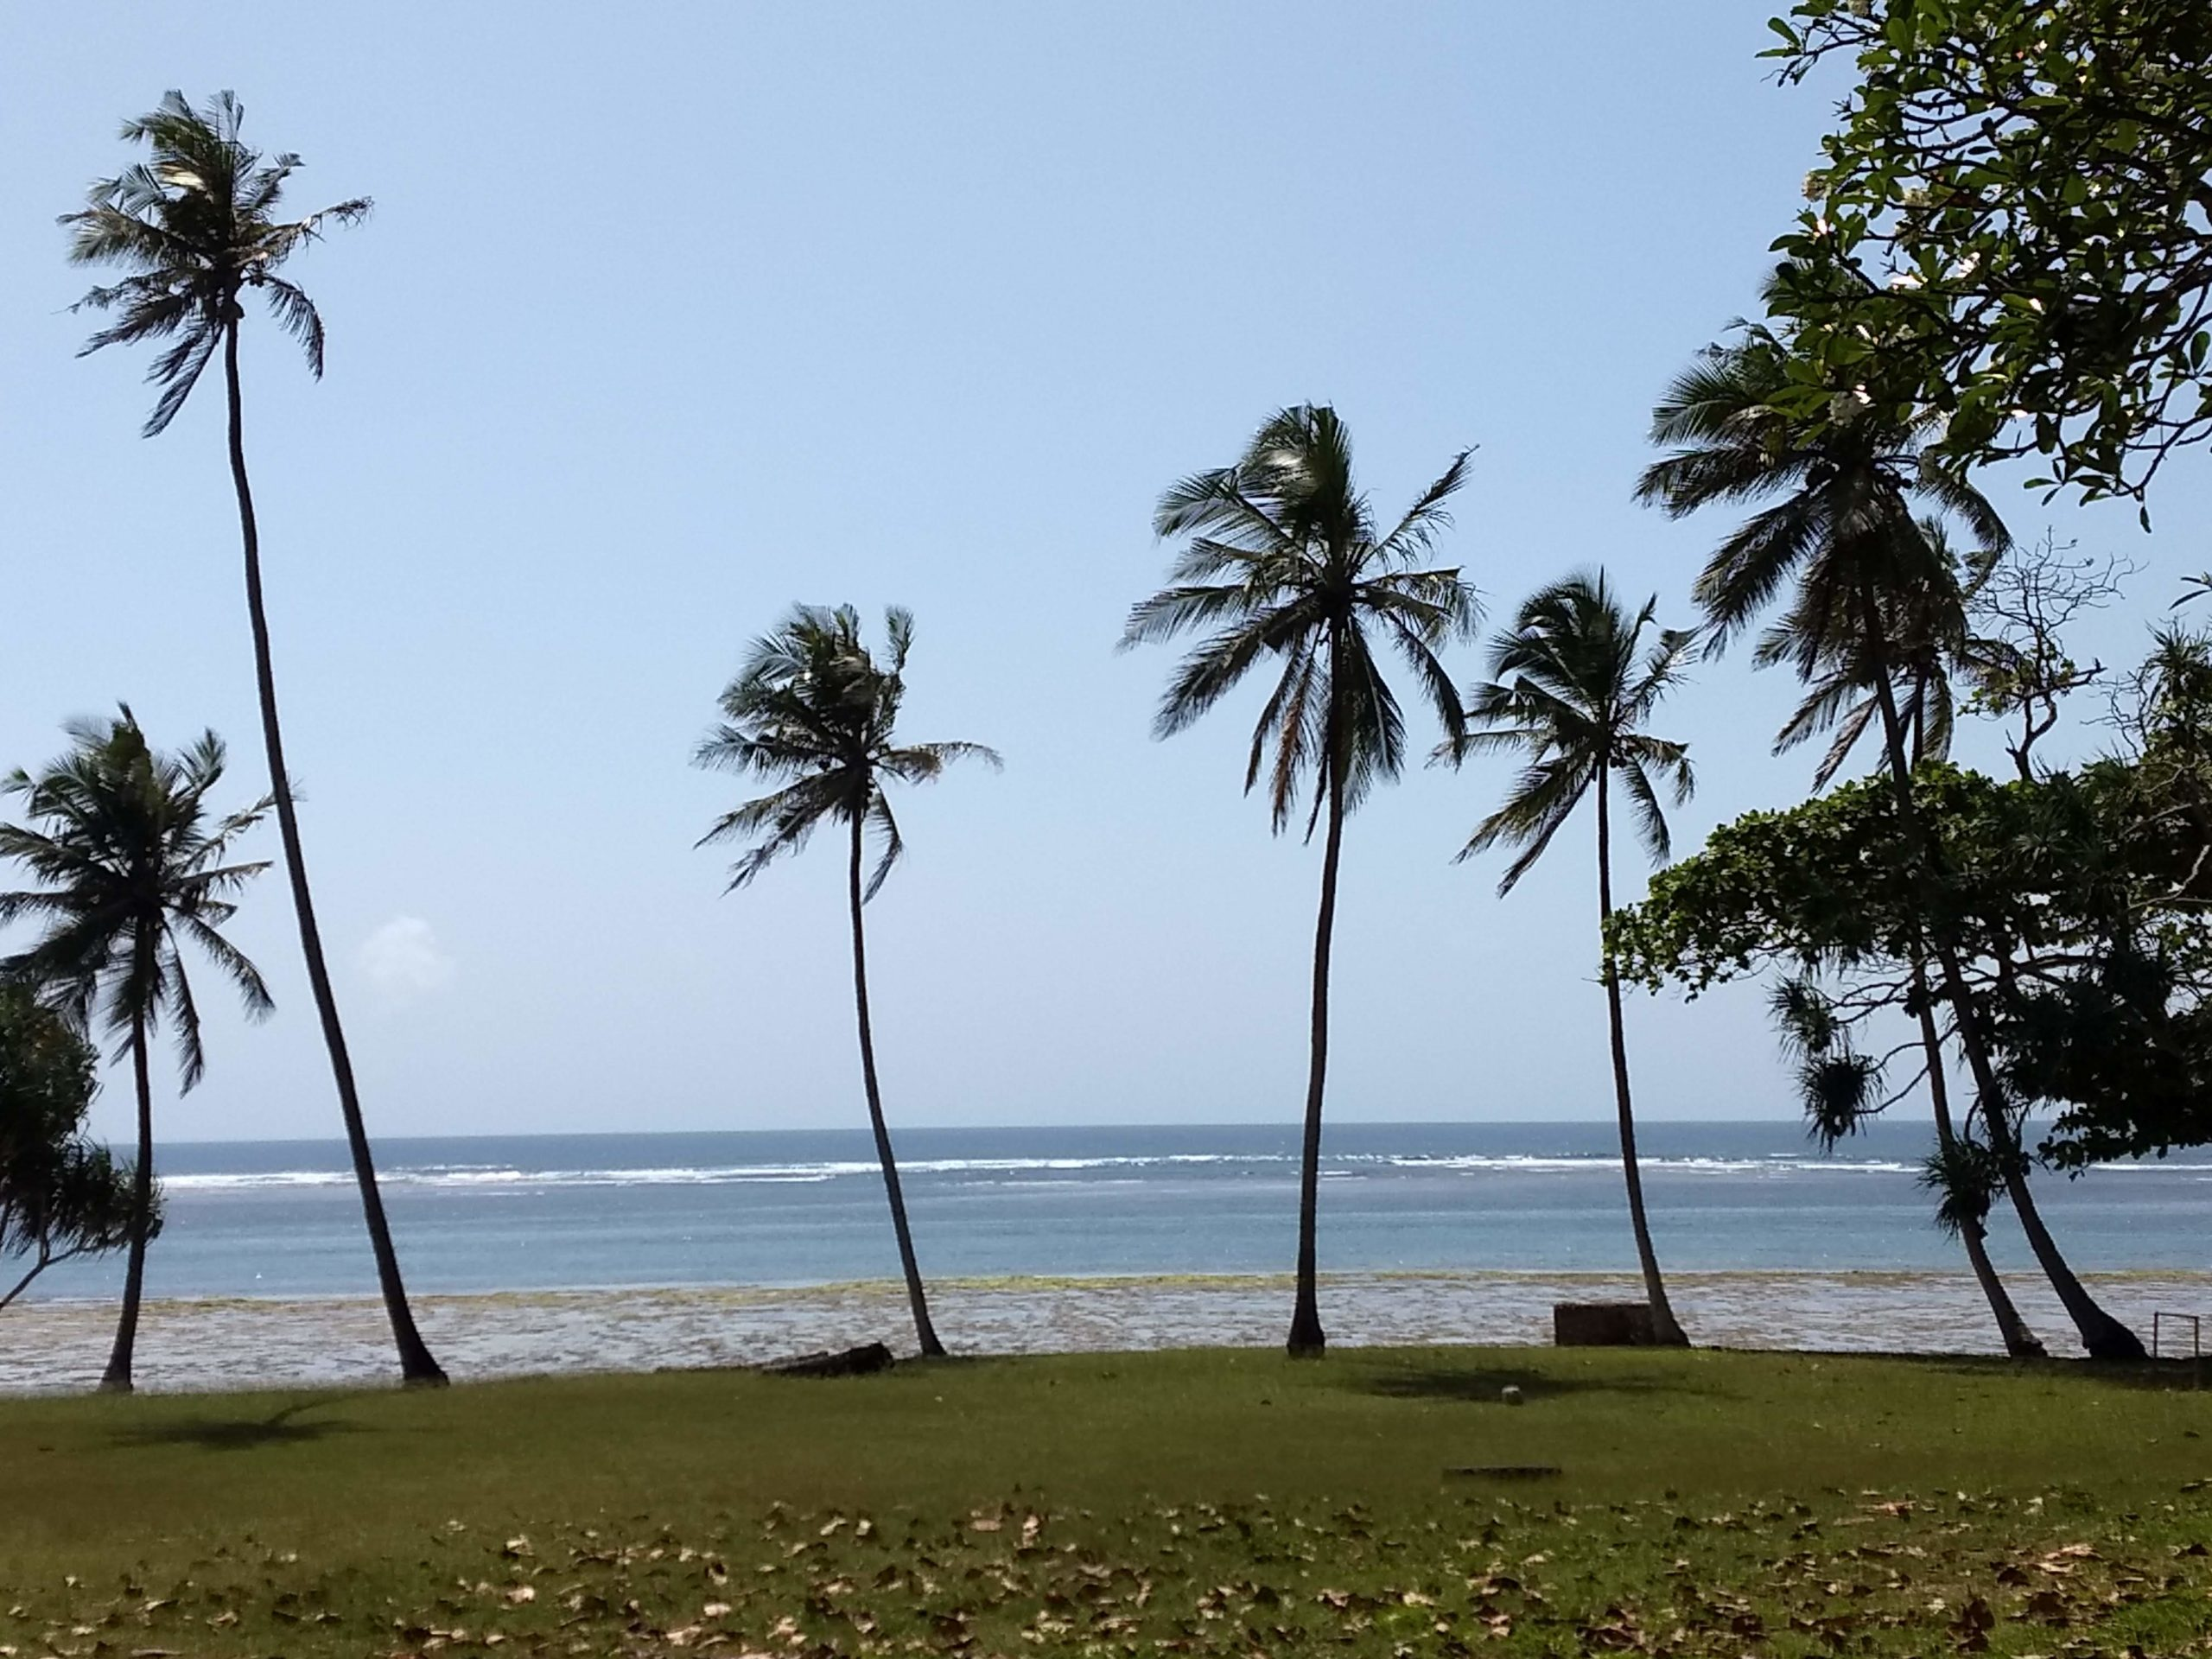 Diani Beach - Coconut trees